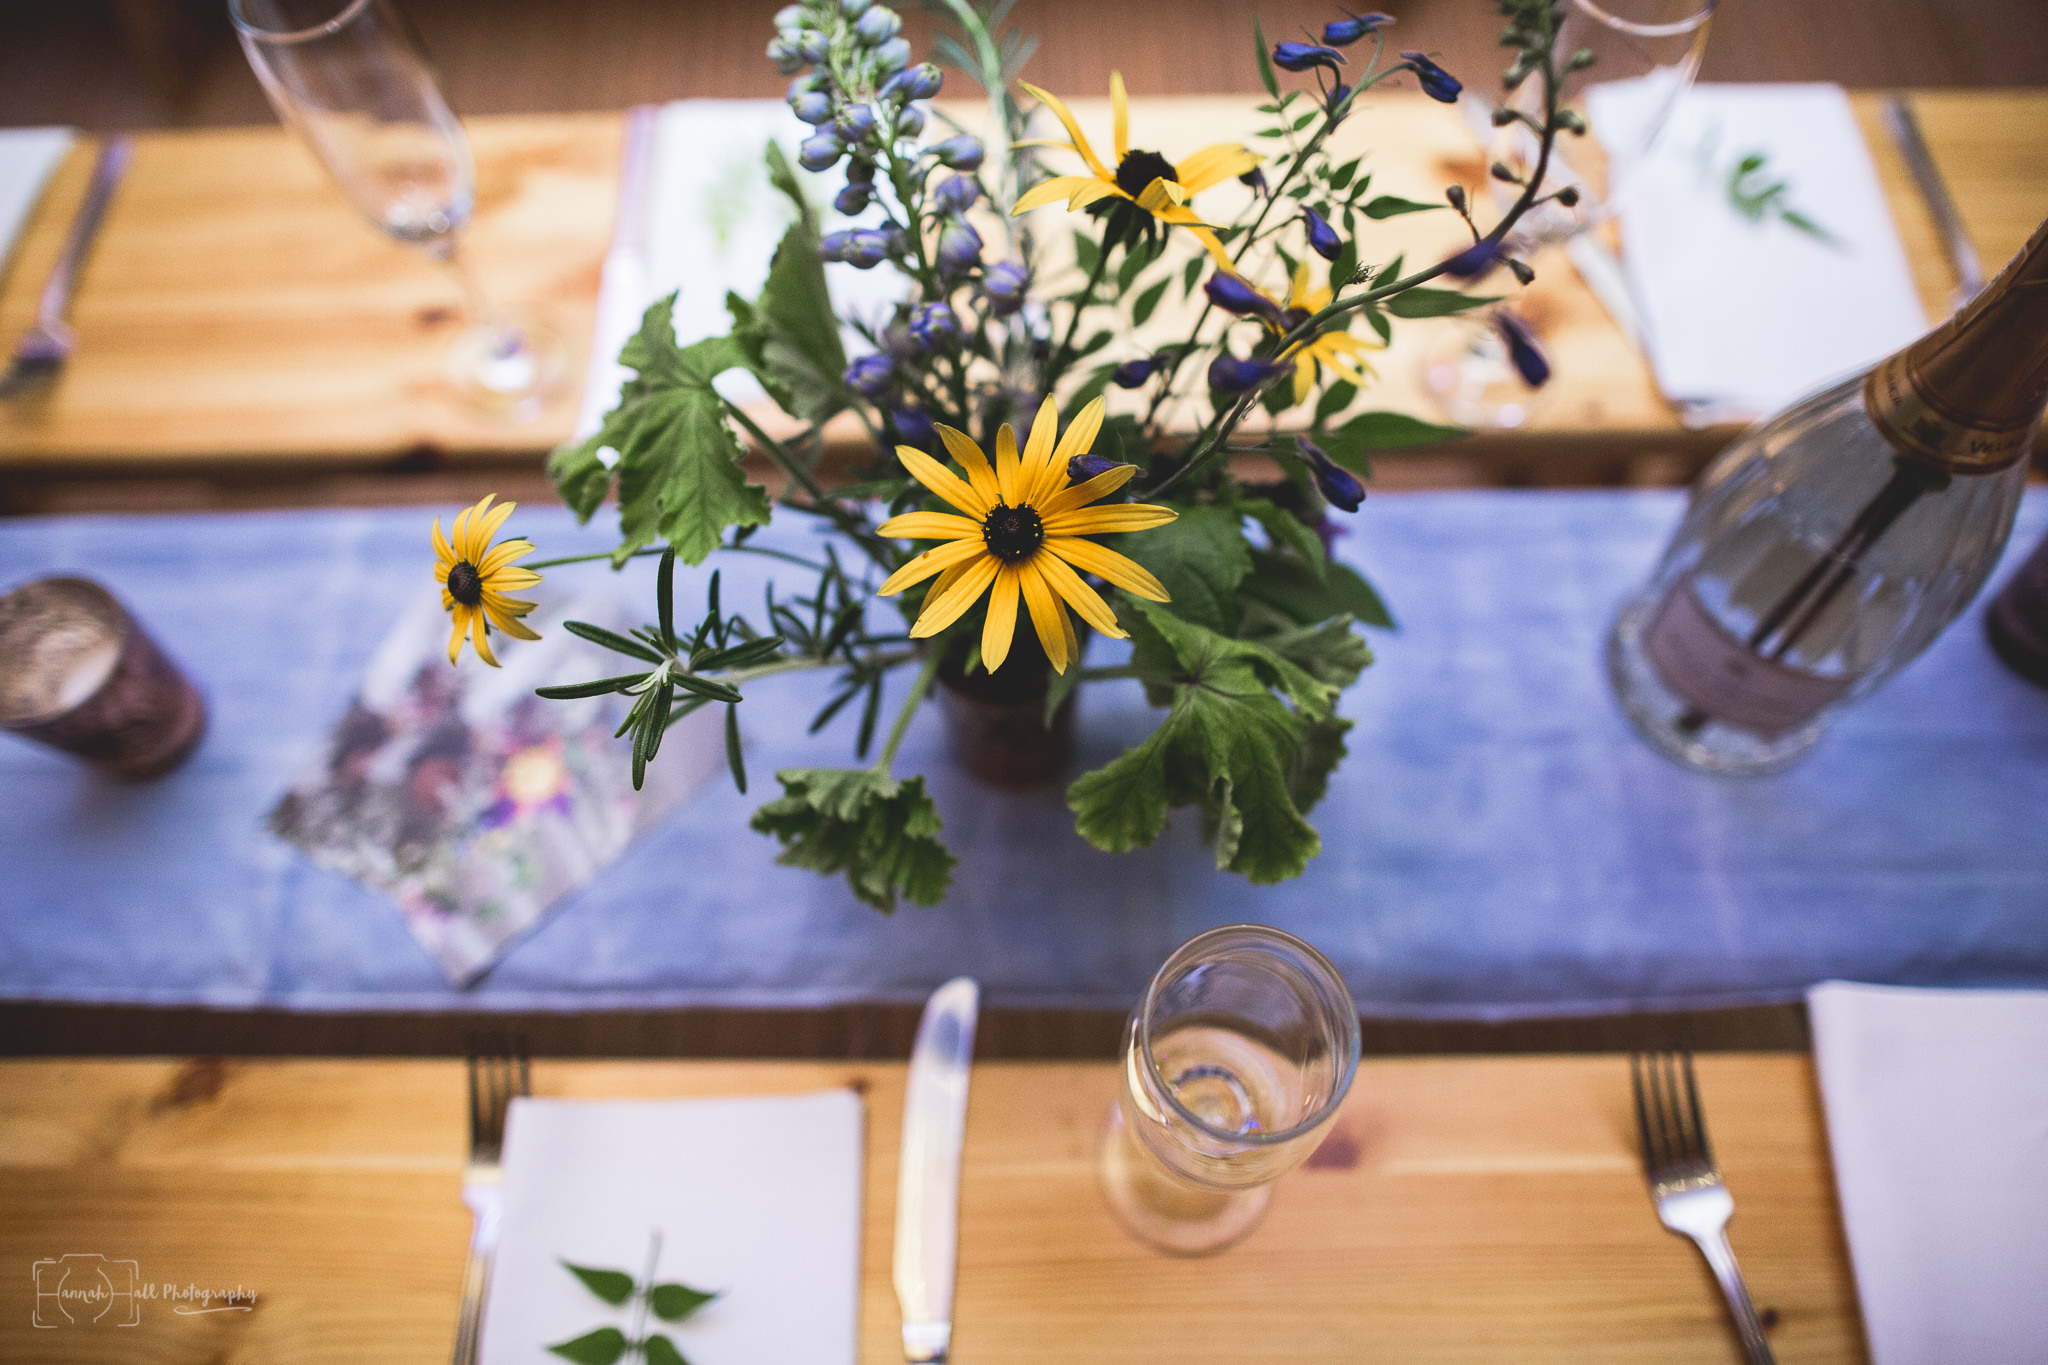 hhp_derbyshire_wedding_photographer-44